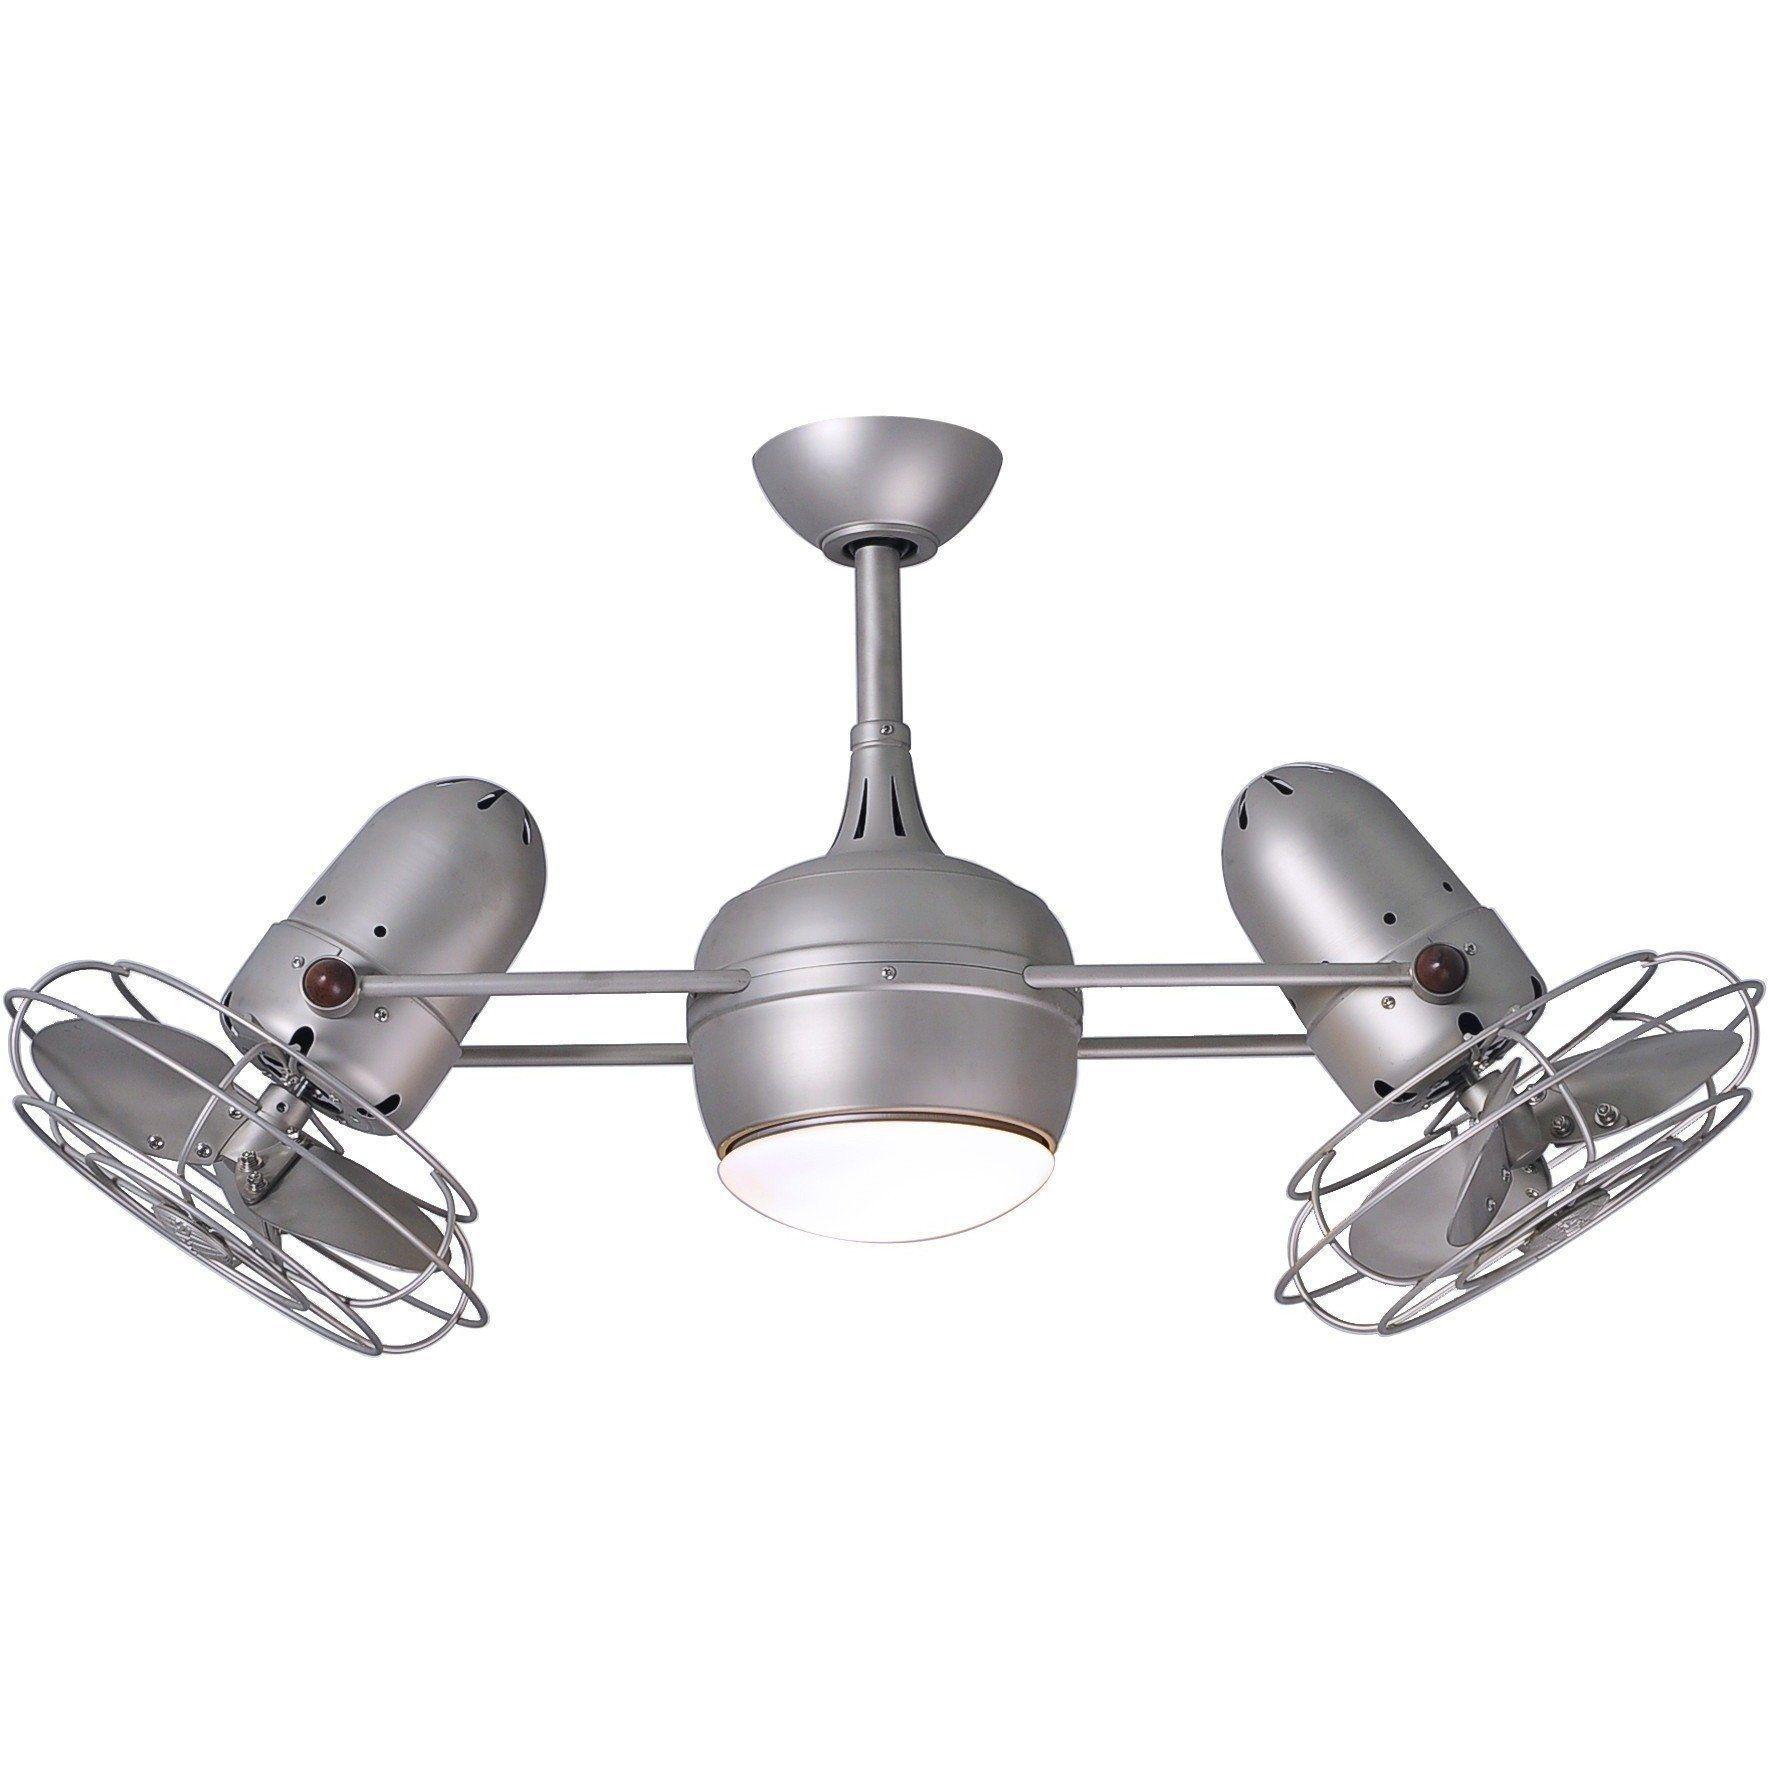 Dagny Dual Ceiling Fan Brushed Nickel Metal Blades Light Kit